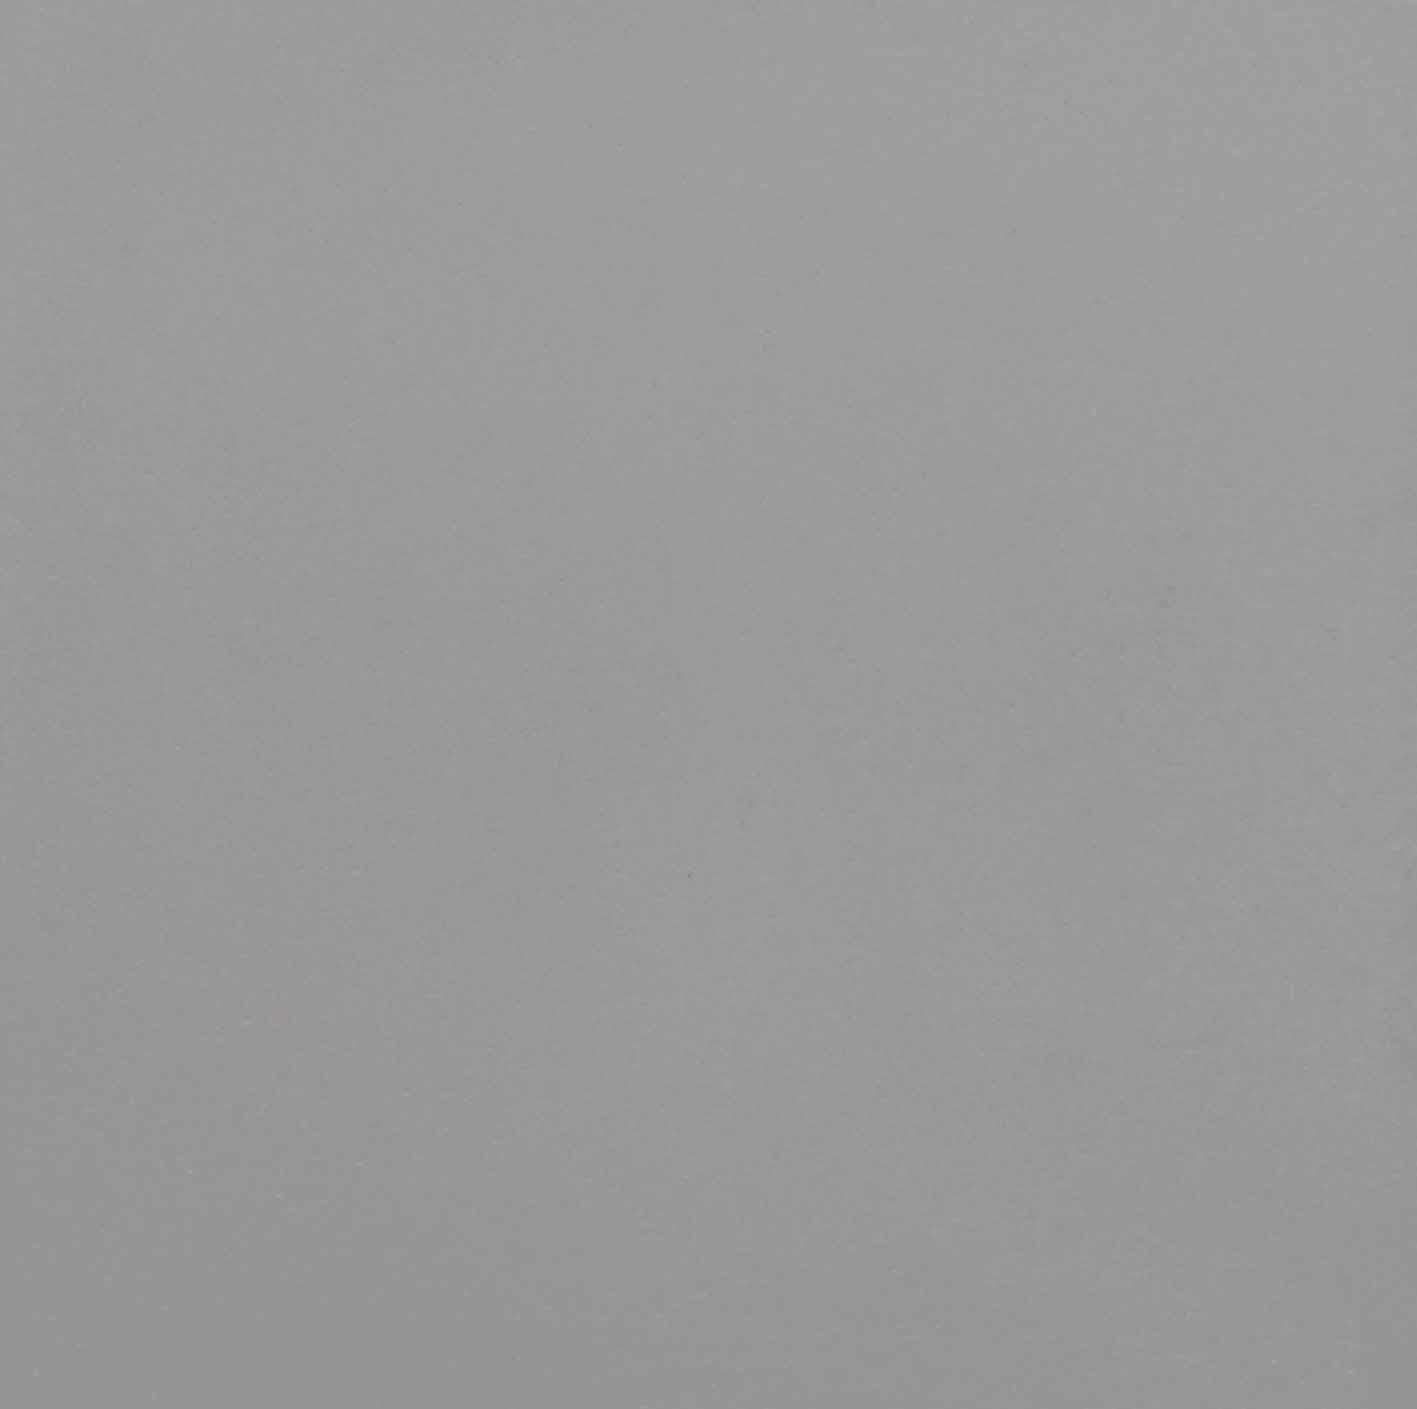 zementfliese serie castillo uni farbe hellgrau 12 von replicata 200 x 200 x 20 mm replikate. Black Bedroom Furniture Sets. Home Design Ideas